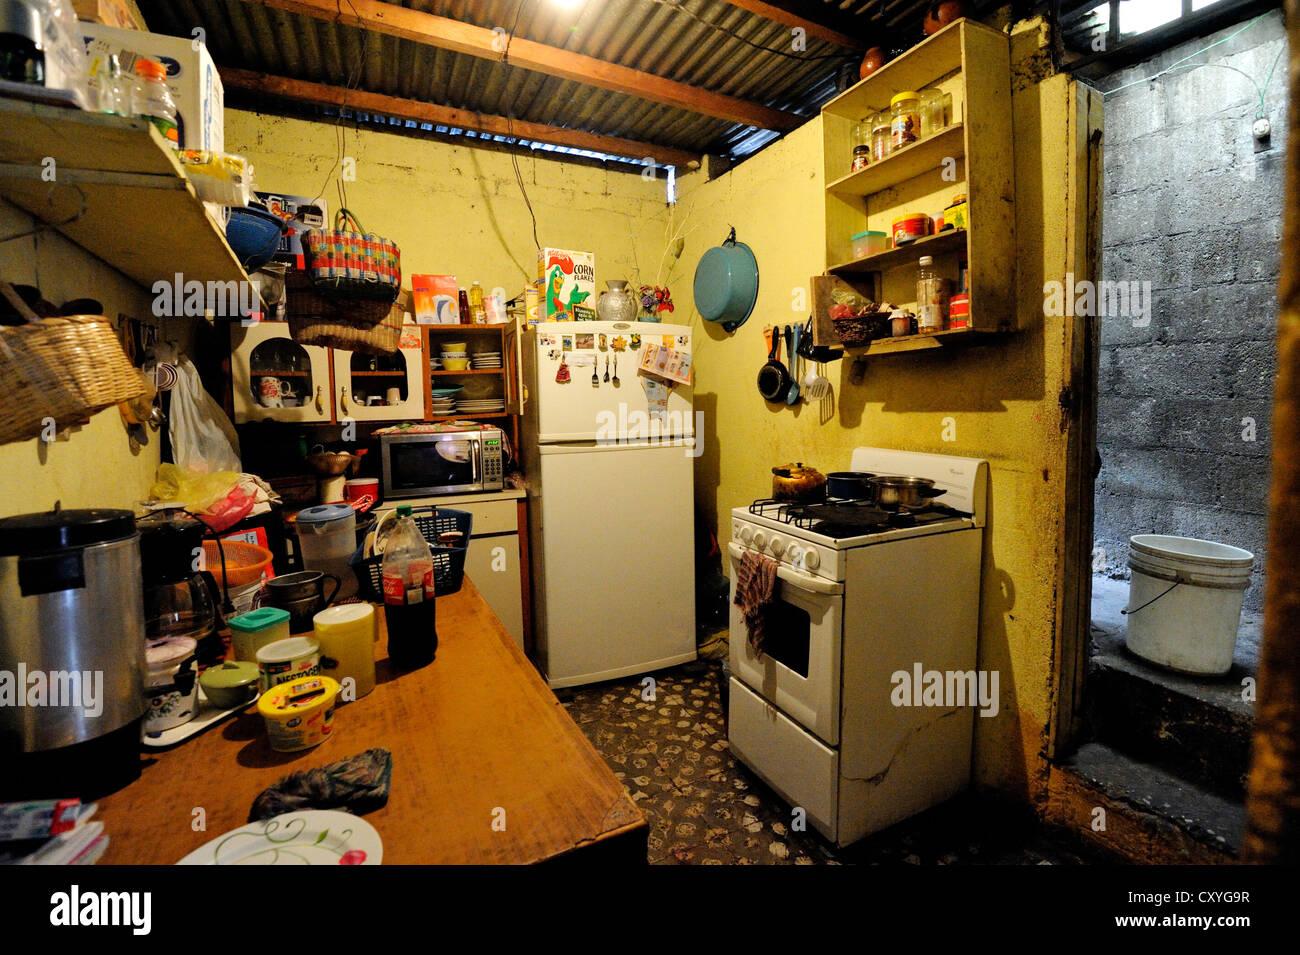 Humble kitchen in a poor neighborhood, El Esfuerzo slum, Guatemala City, Guatemala, Central America - Stock Image